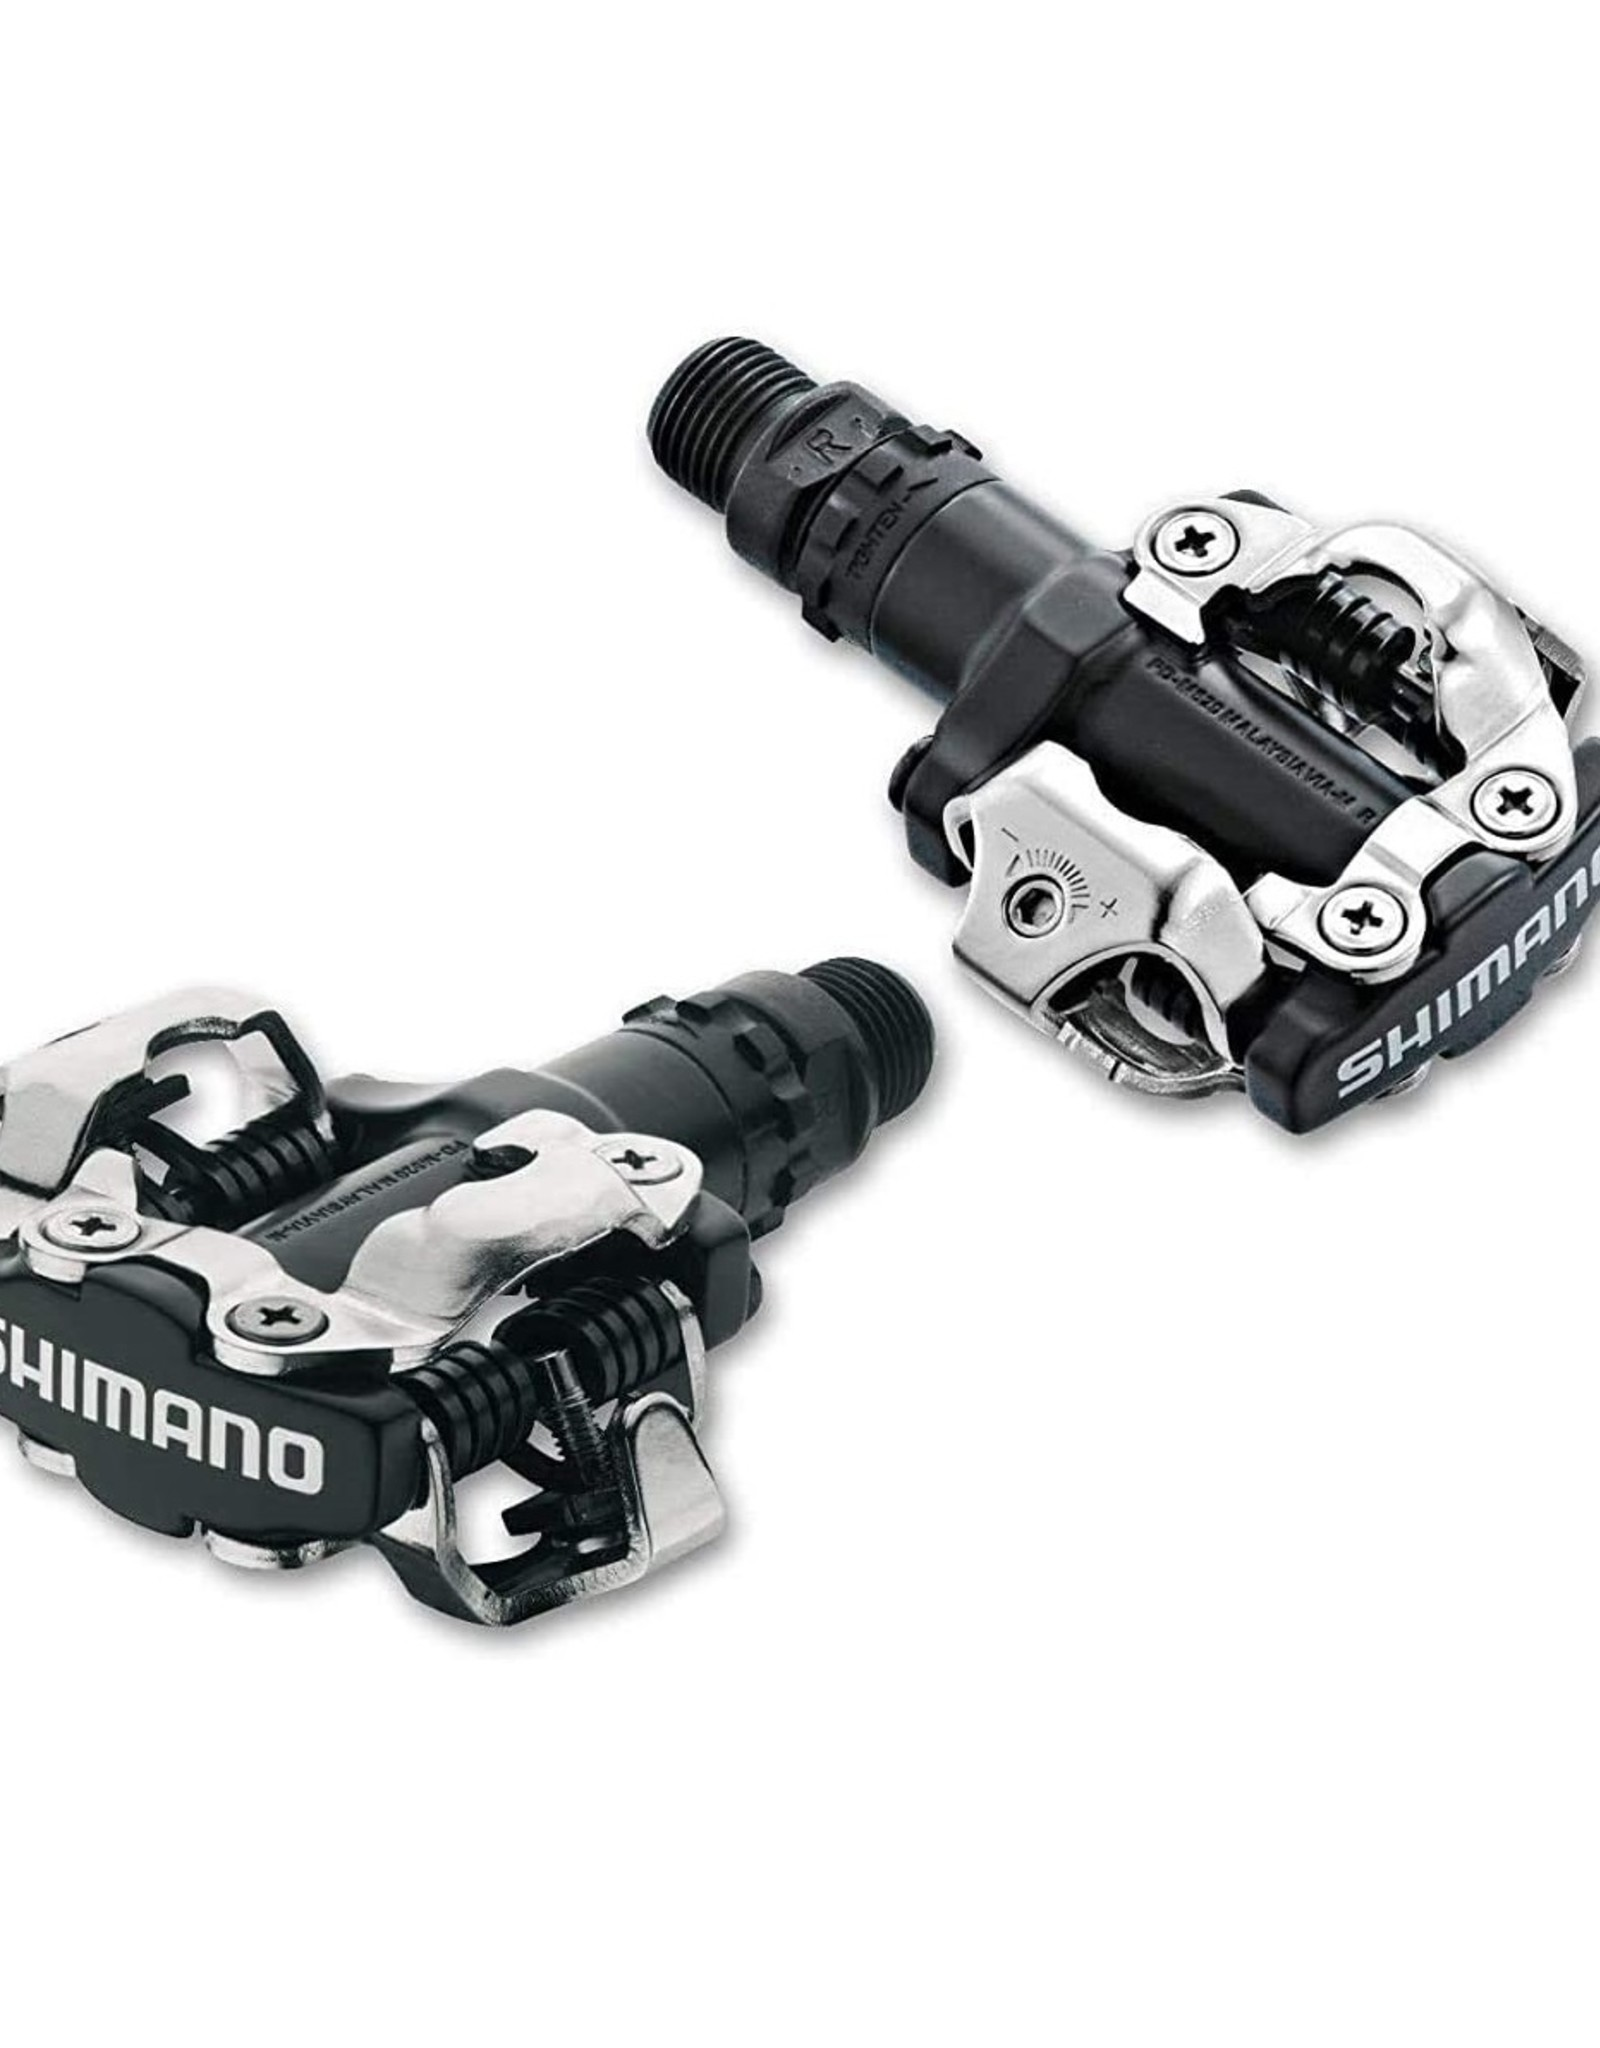 Shimano Pedals - Shimano PD-M520 Black (SPD)